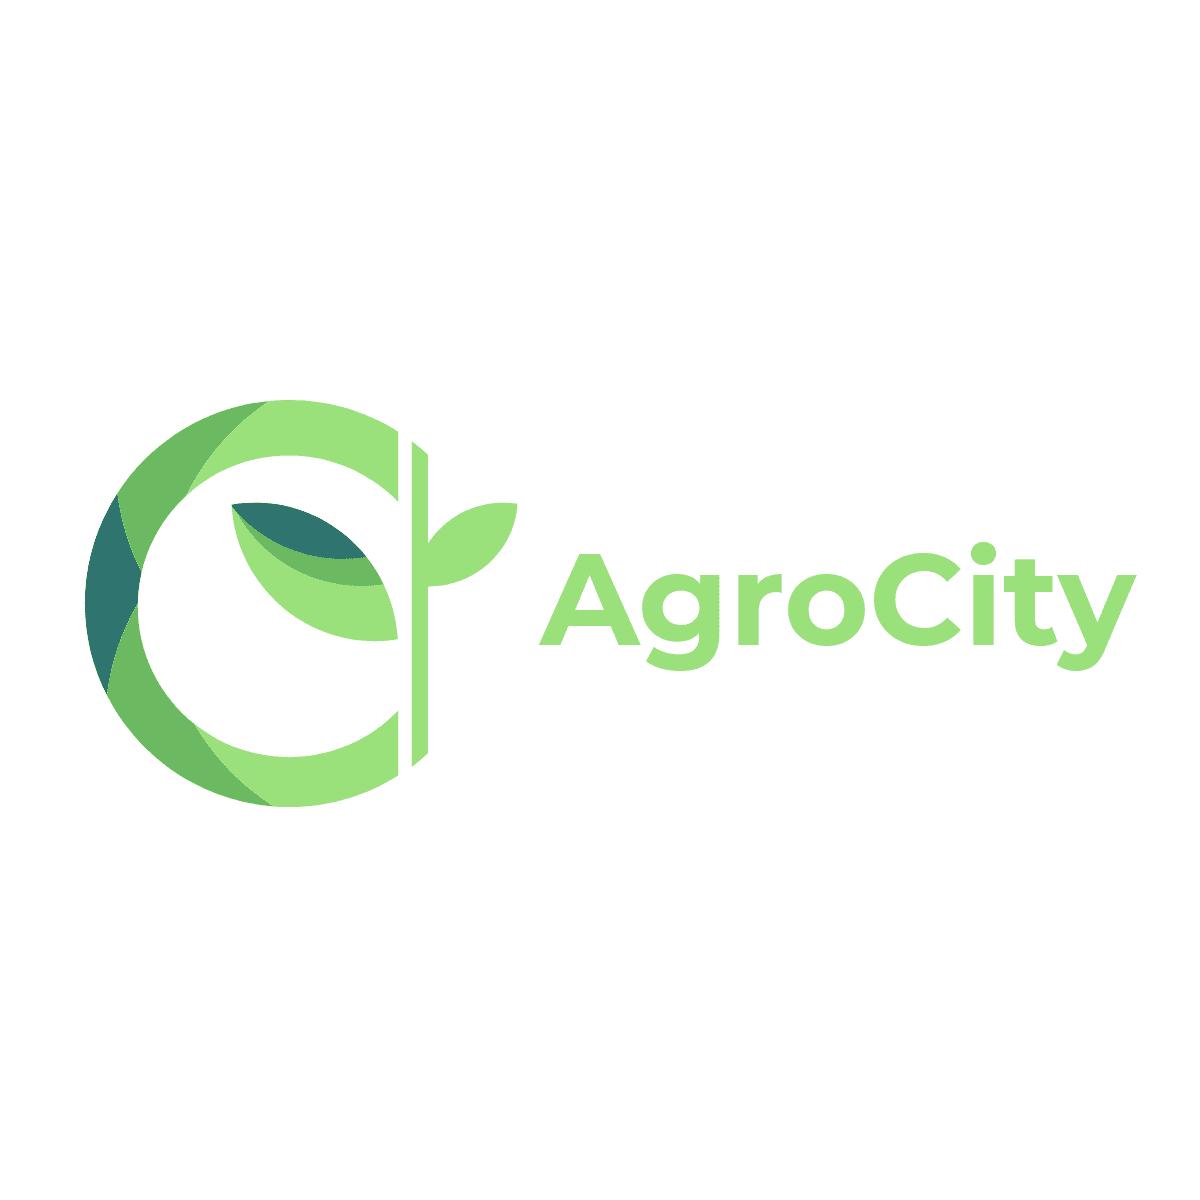 Holde Agri Invest devine investitor strategic în start-upul Agrocity